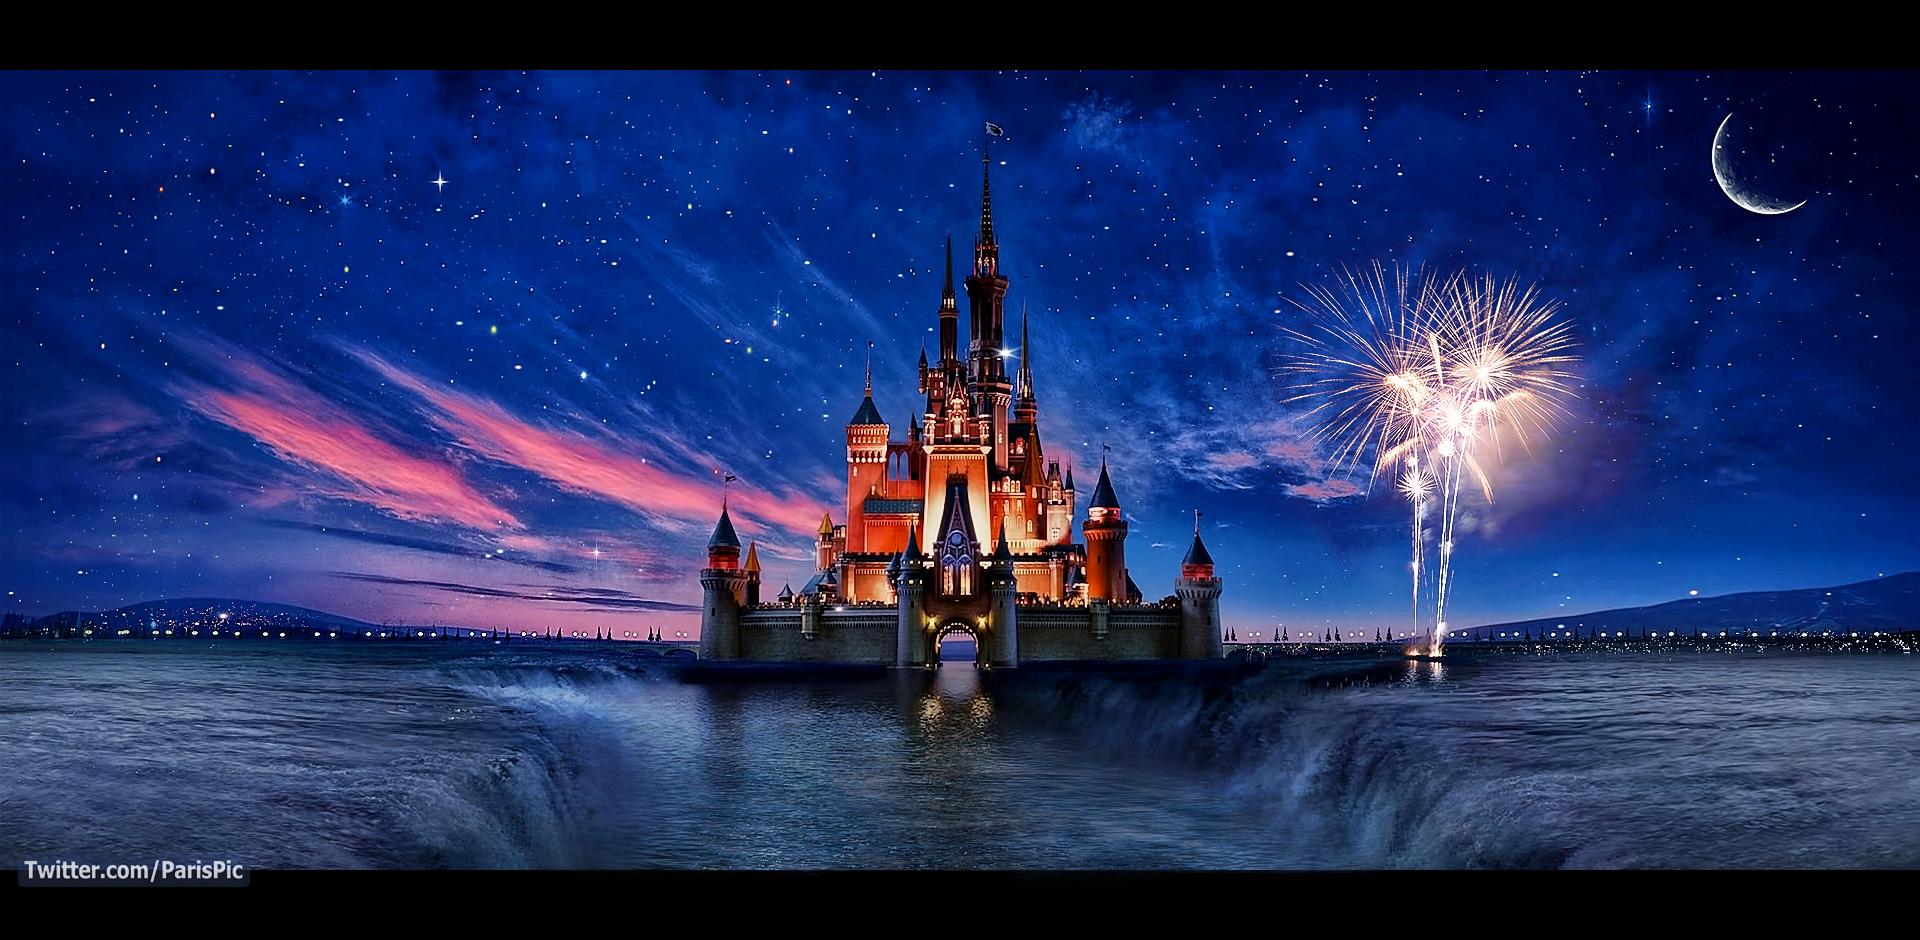 Disneyland Castle California Wallpaper Parispic By Parispic On Deviantart